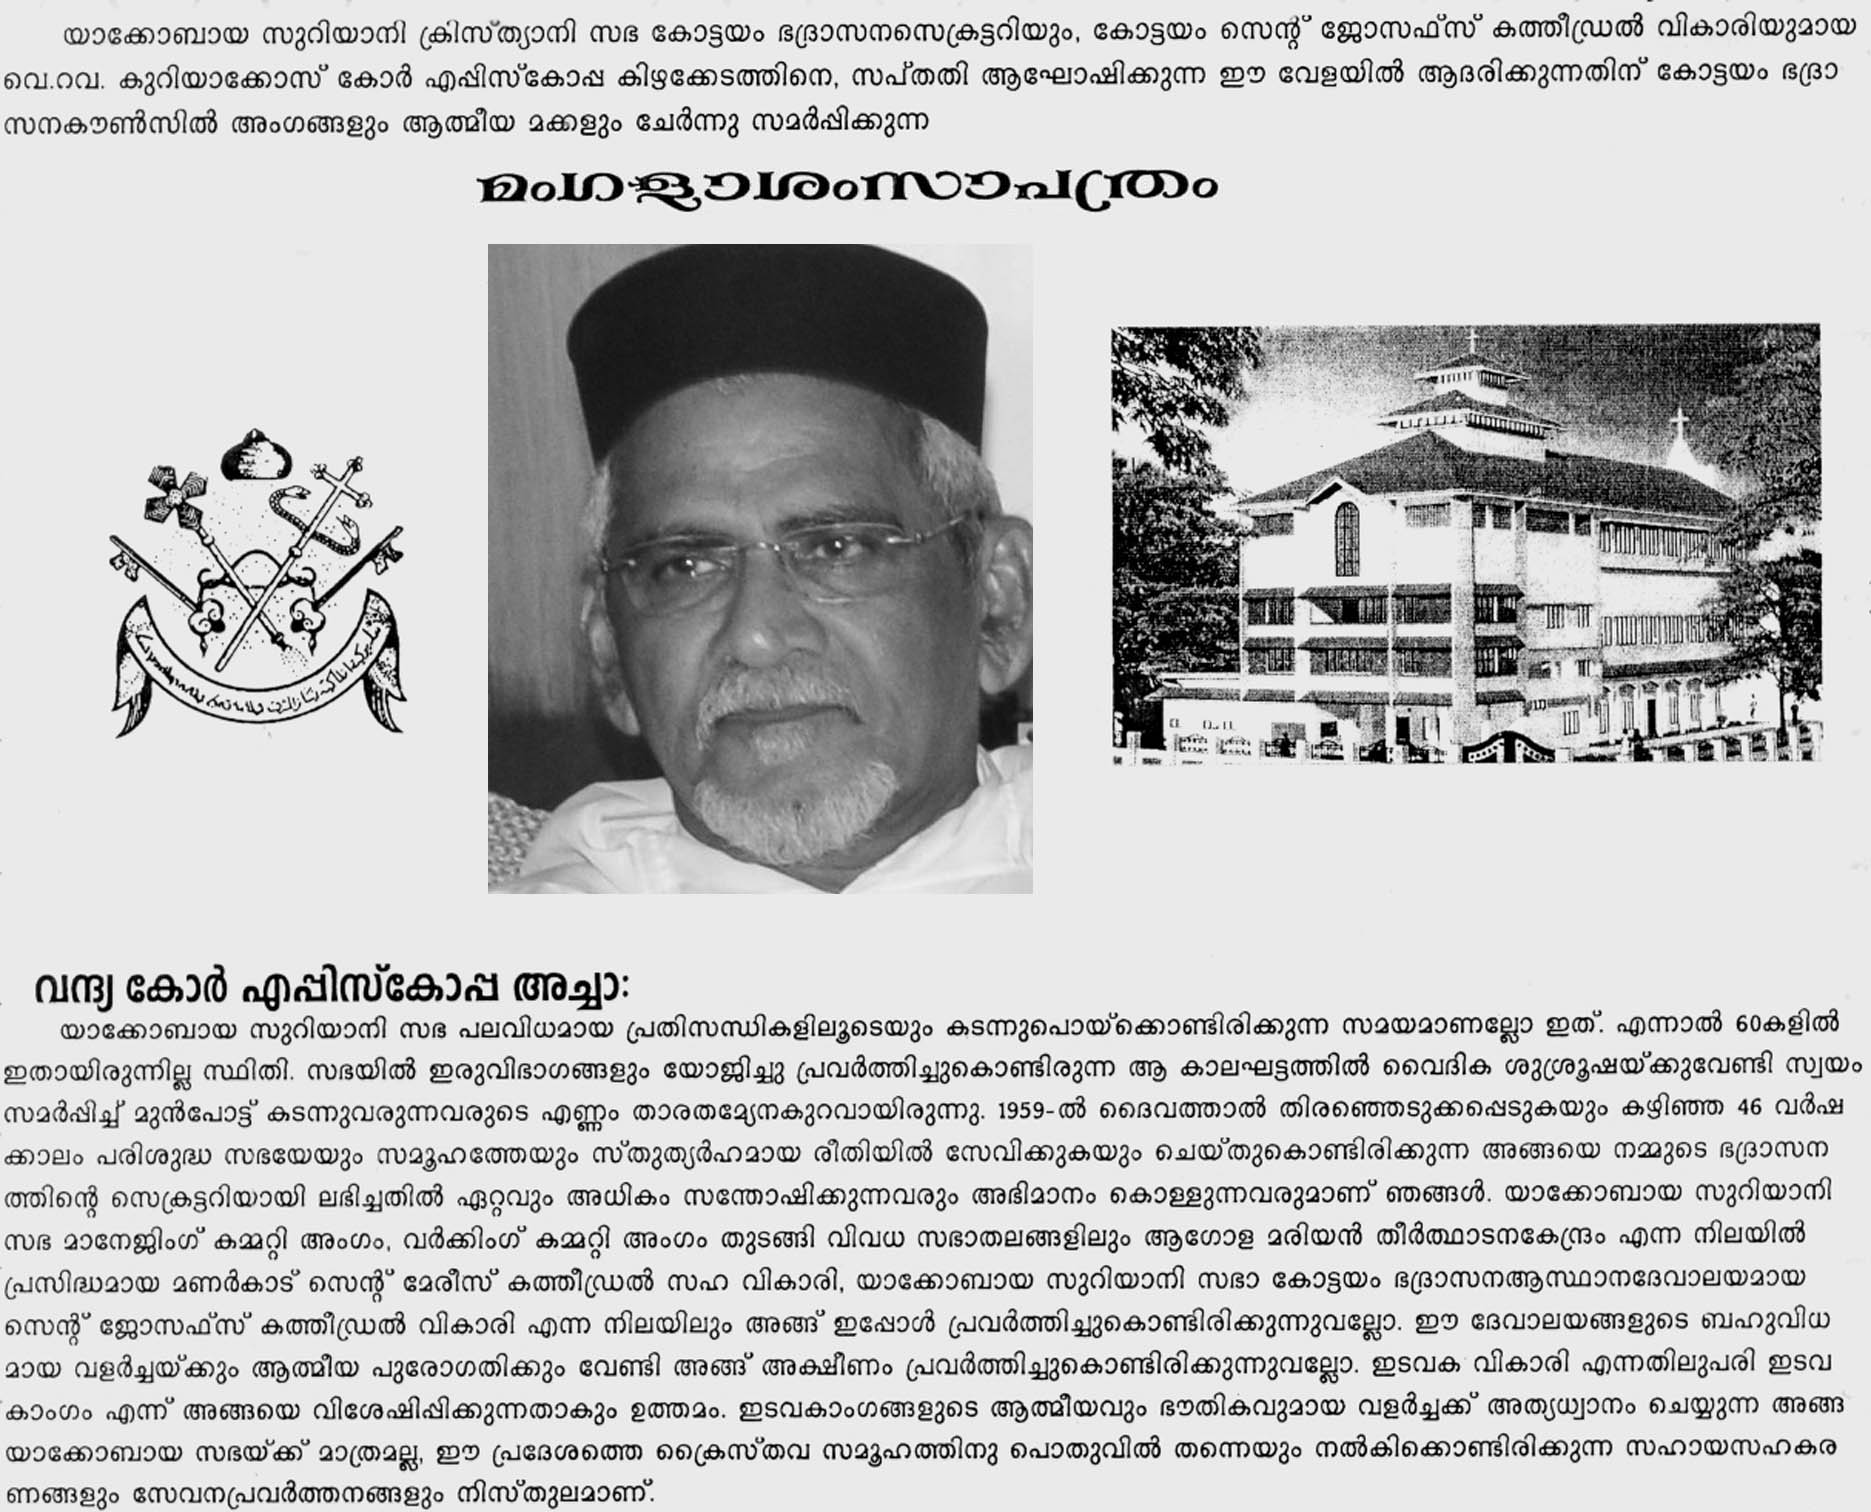 V Rev. Kuriakose Kizhakkedathu Cor Episcopa - Mangala Pathram